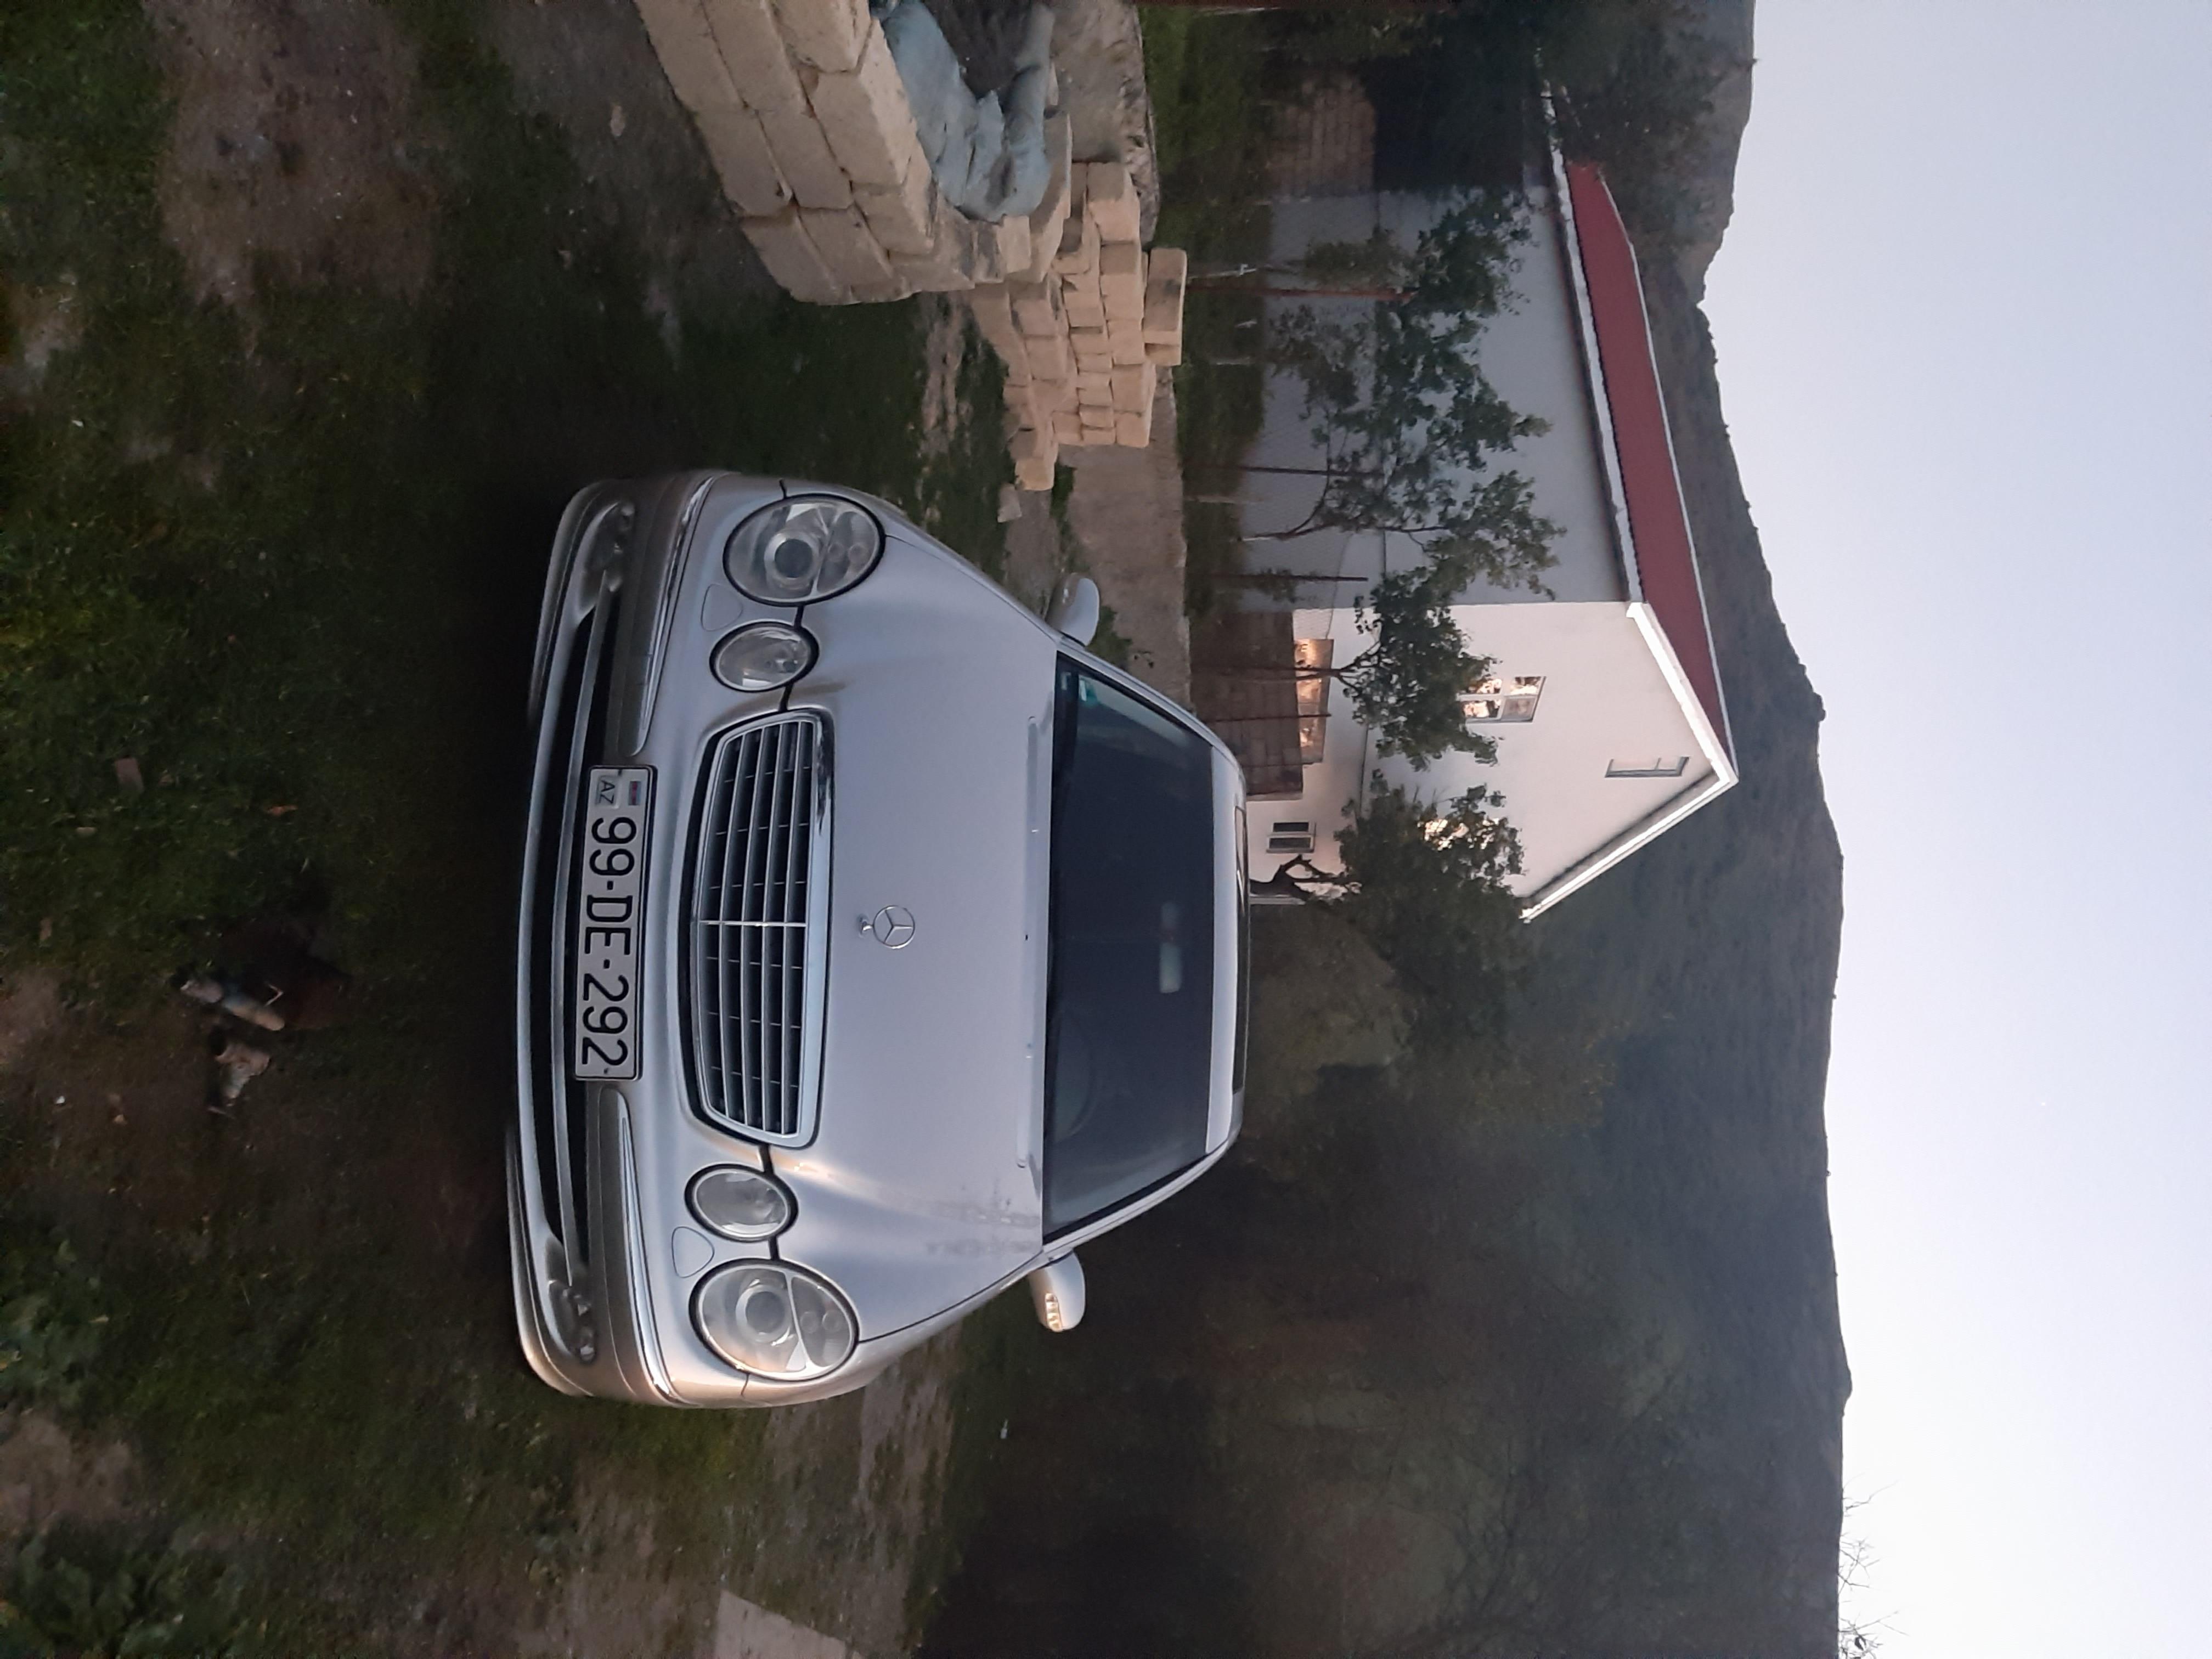 Mercedes-Benz E 240 2.6(lt) 2003 Подержанный  $9000